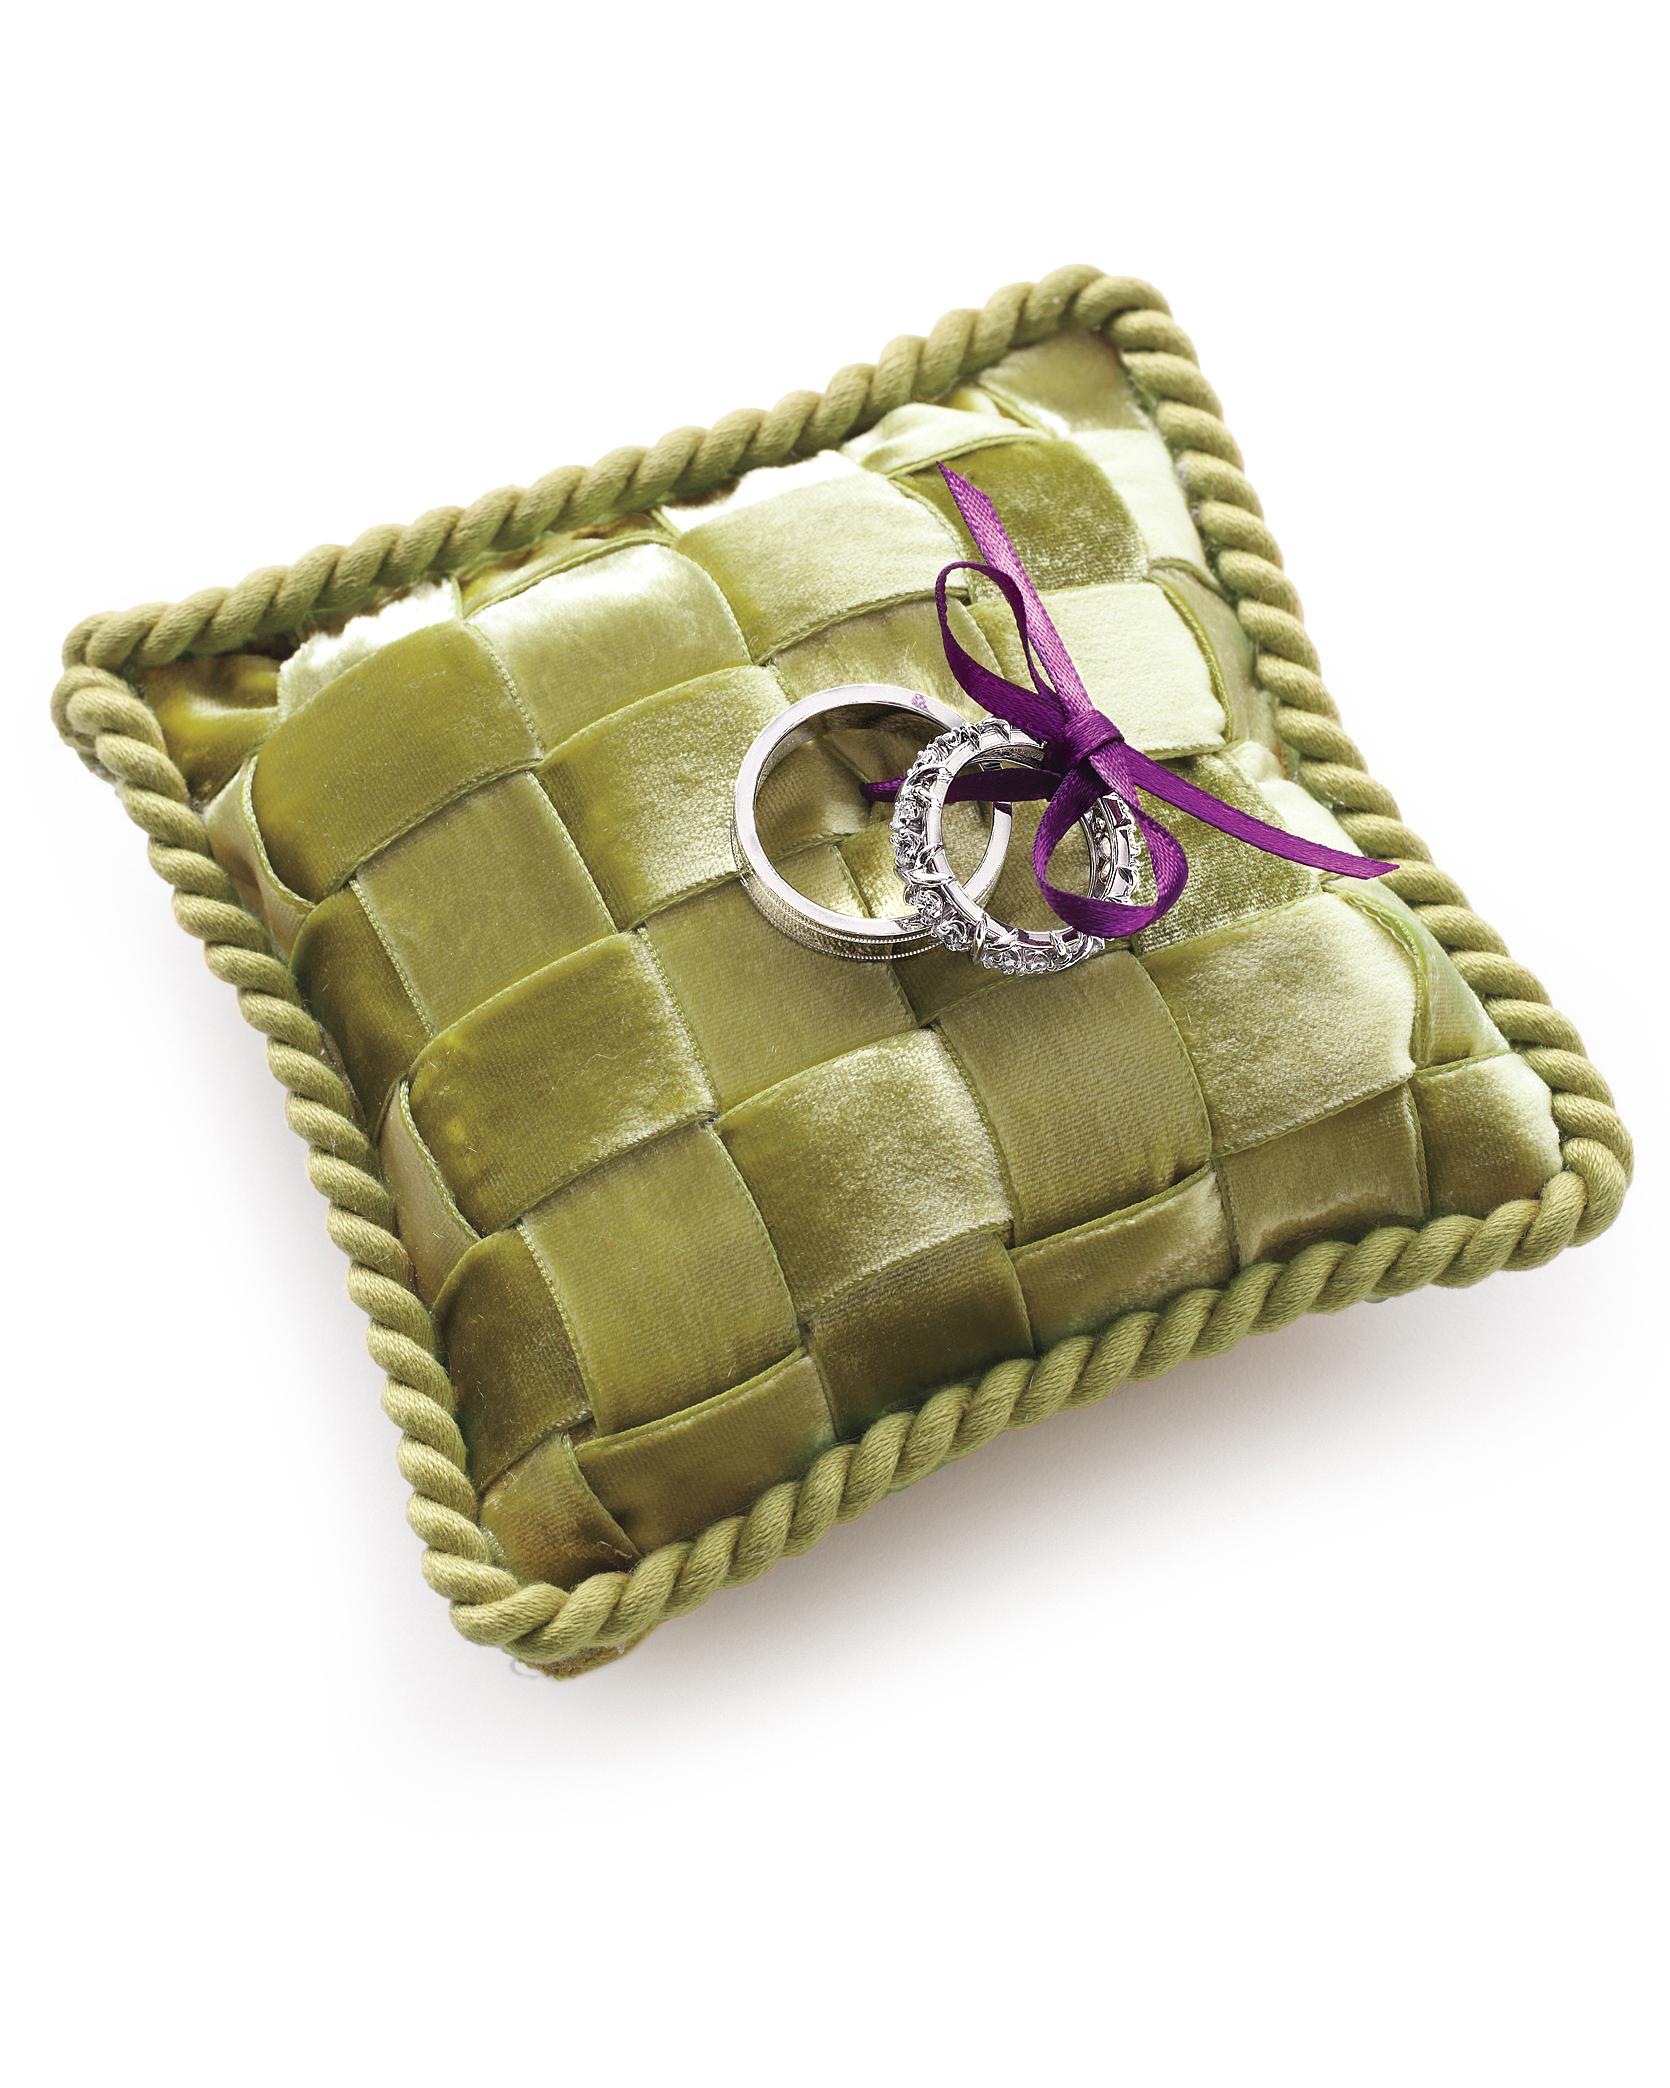 ring-pillow-0811mwd107436.jpg